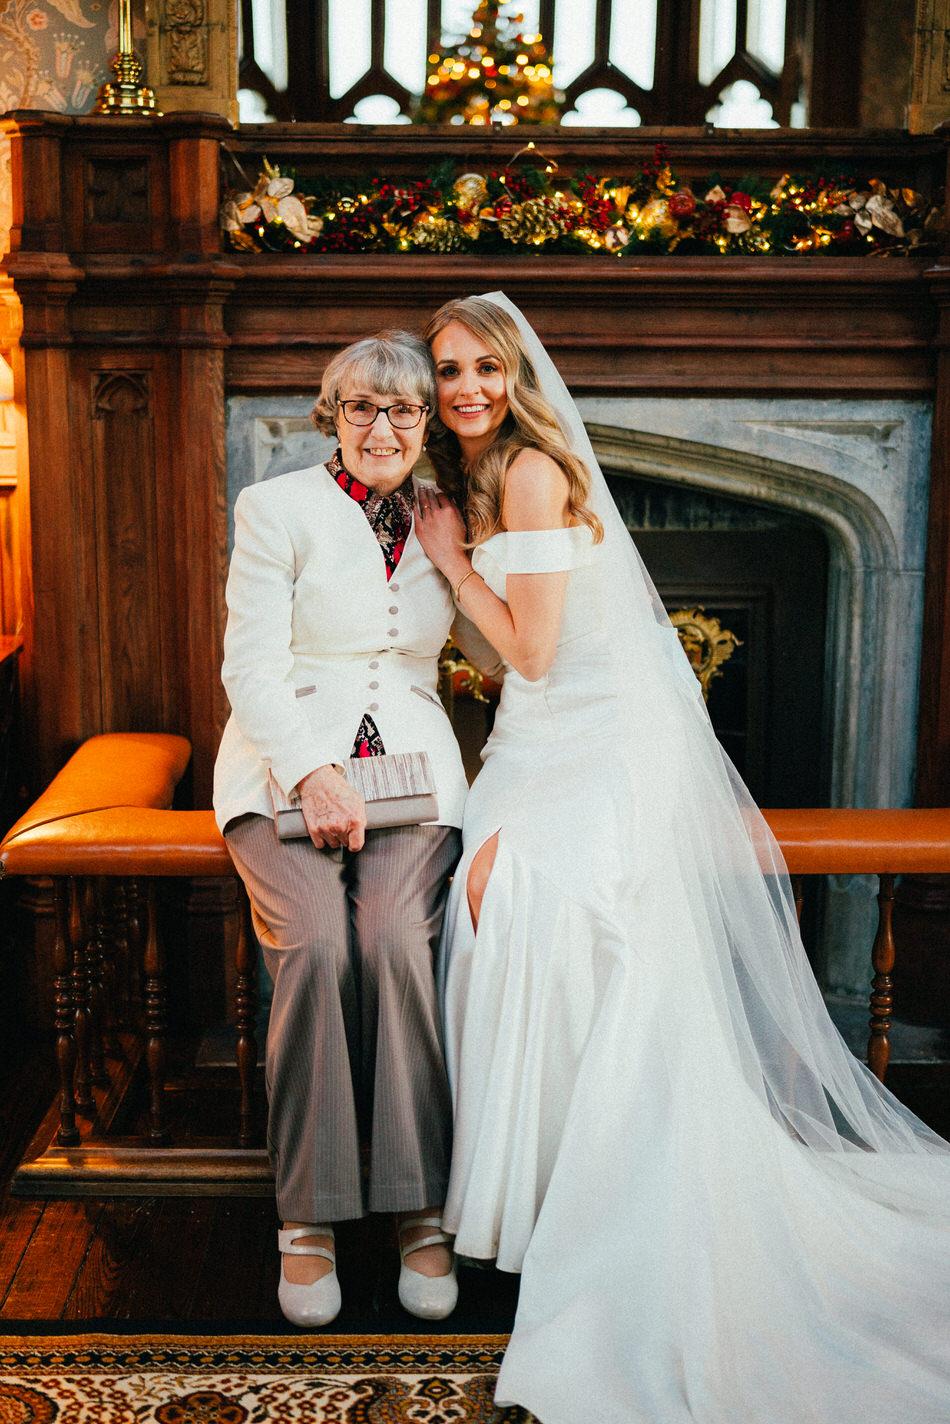 Castle-wedding-ireland-photos- 0241 180